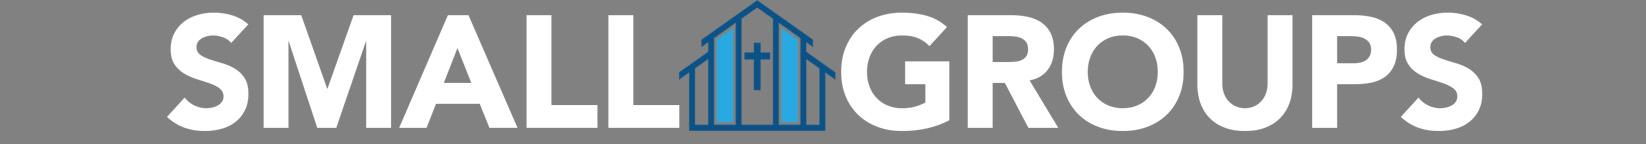 Small Group Logo.jpg